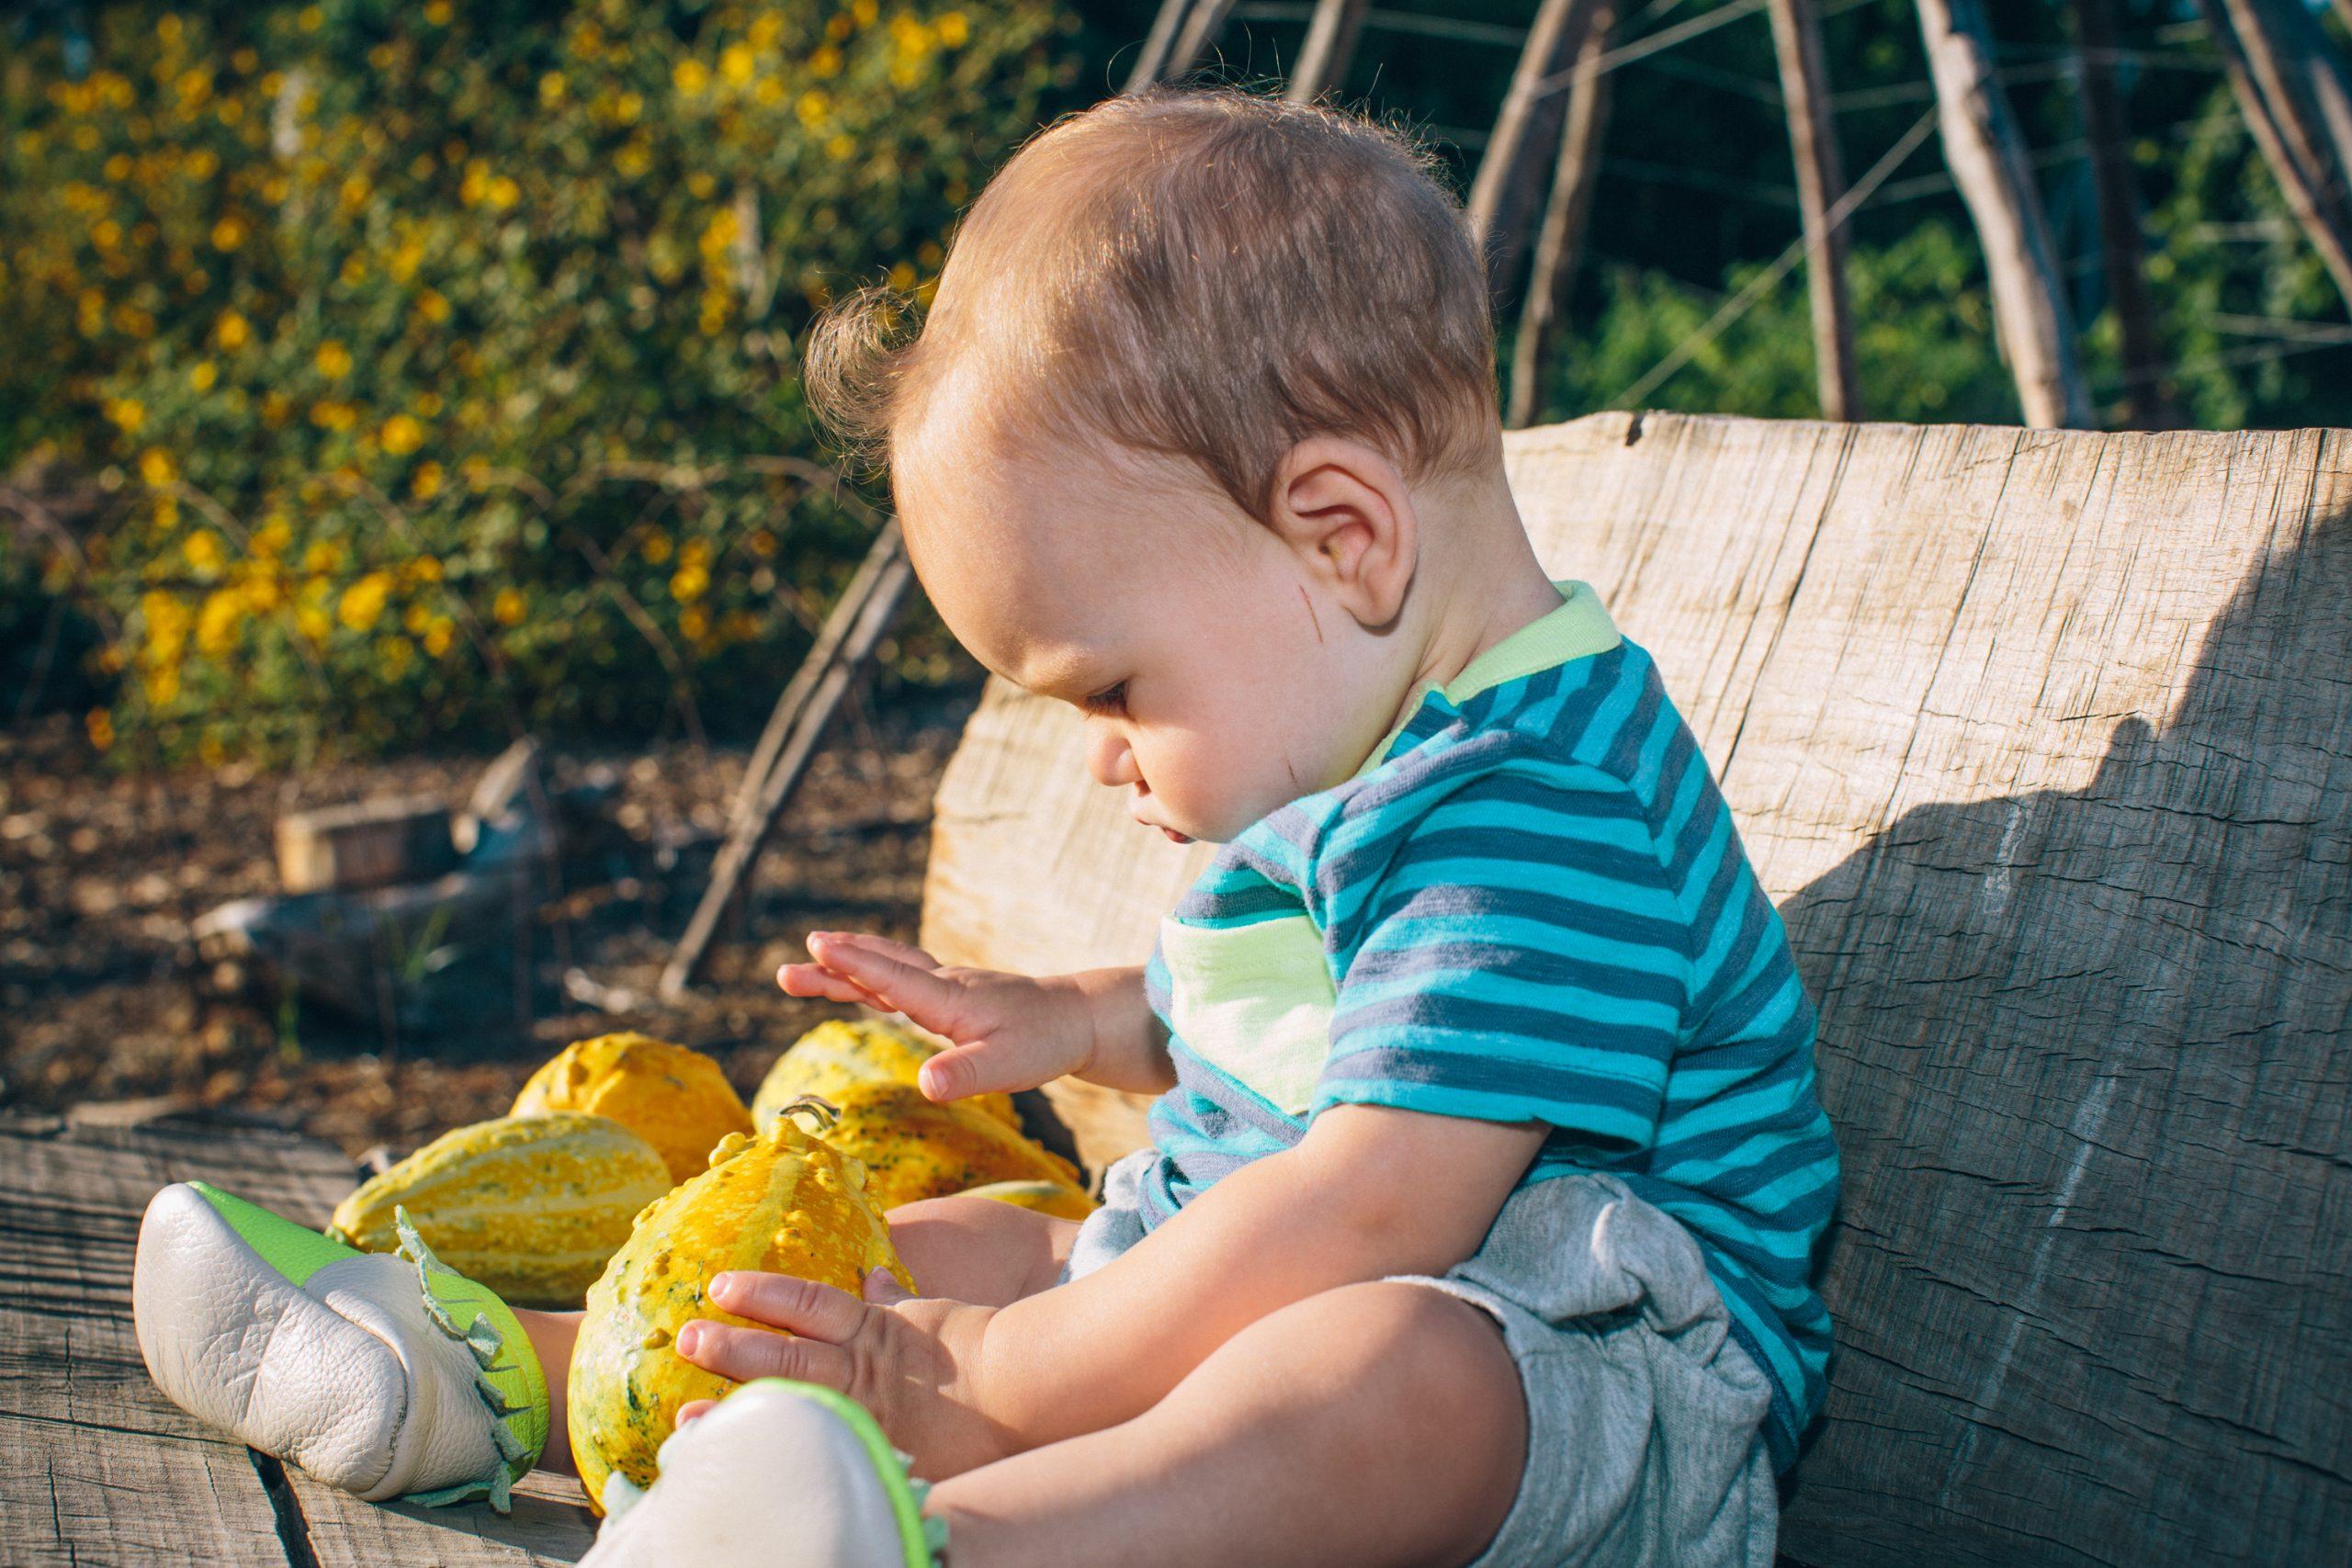 Diana-Milena-Sunkissed-Blonde-Motherhood-Style-Baby-Parenting-Sunset-Santa-Barbara-Organic-Farm